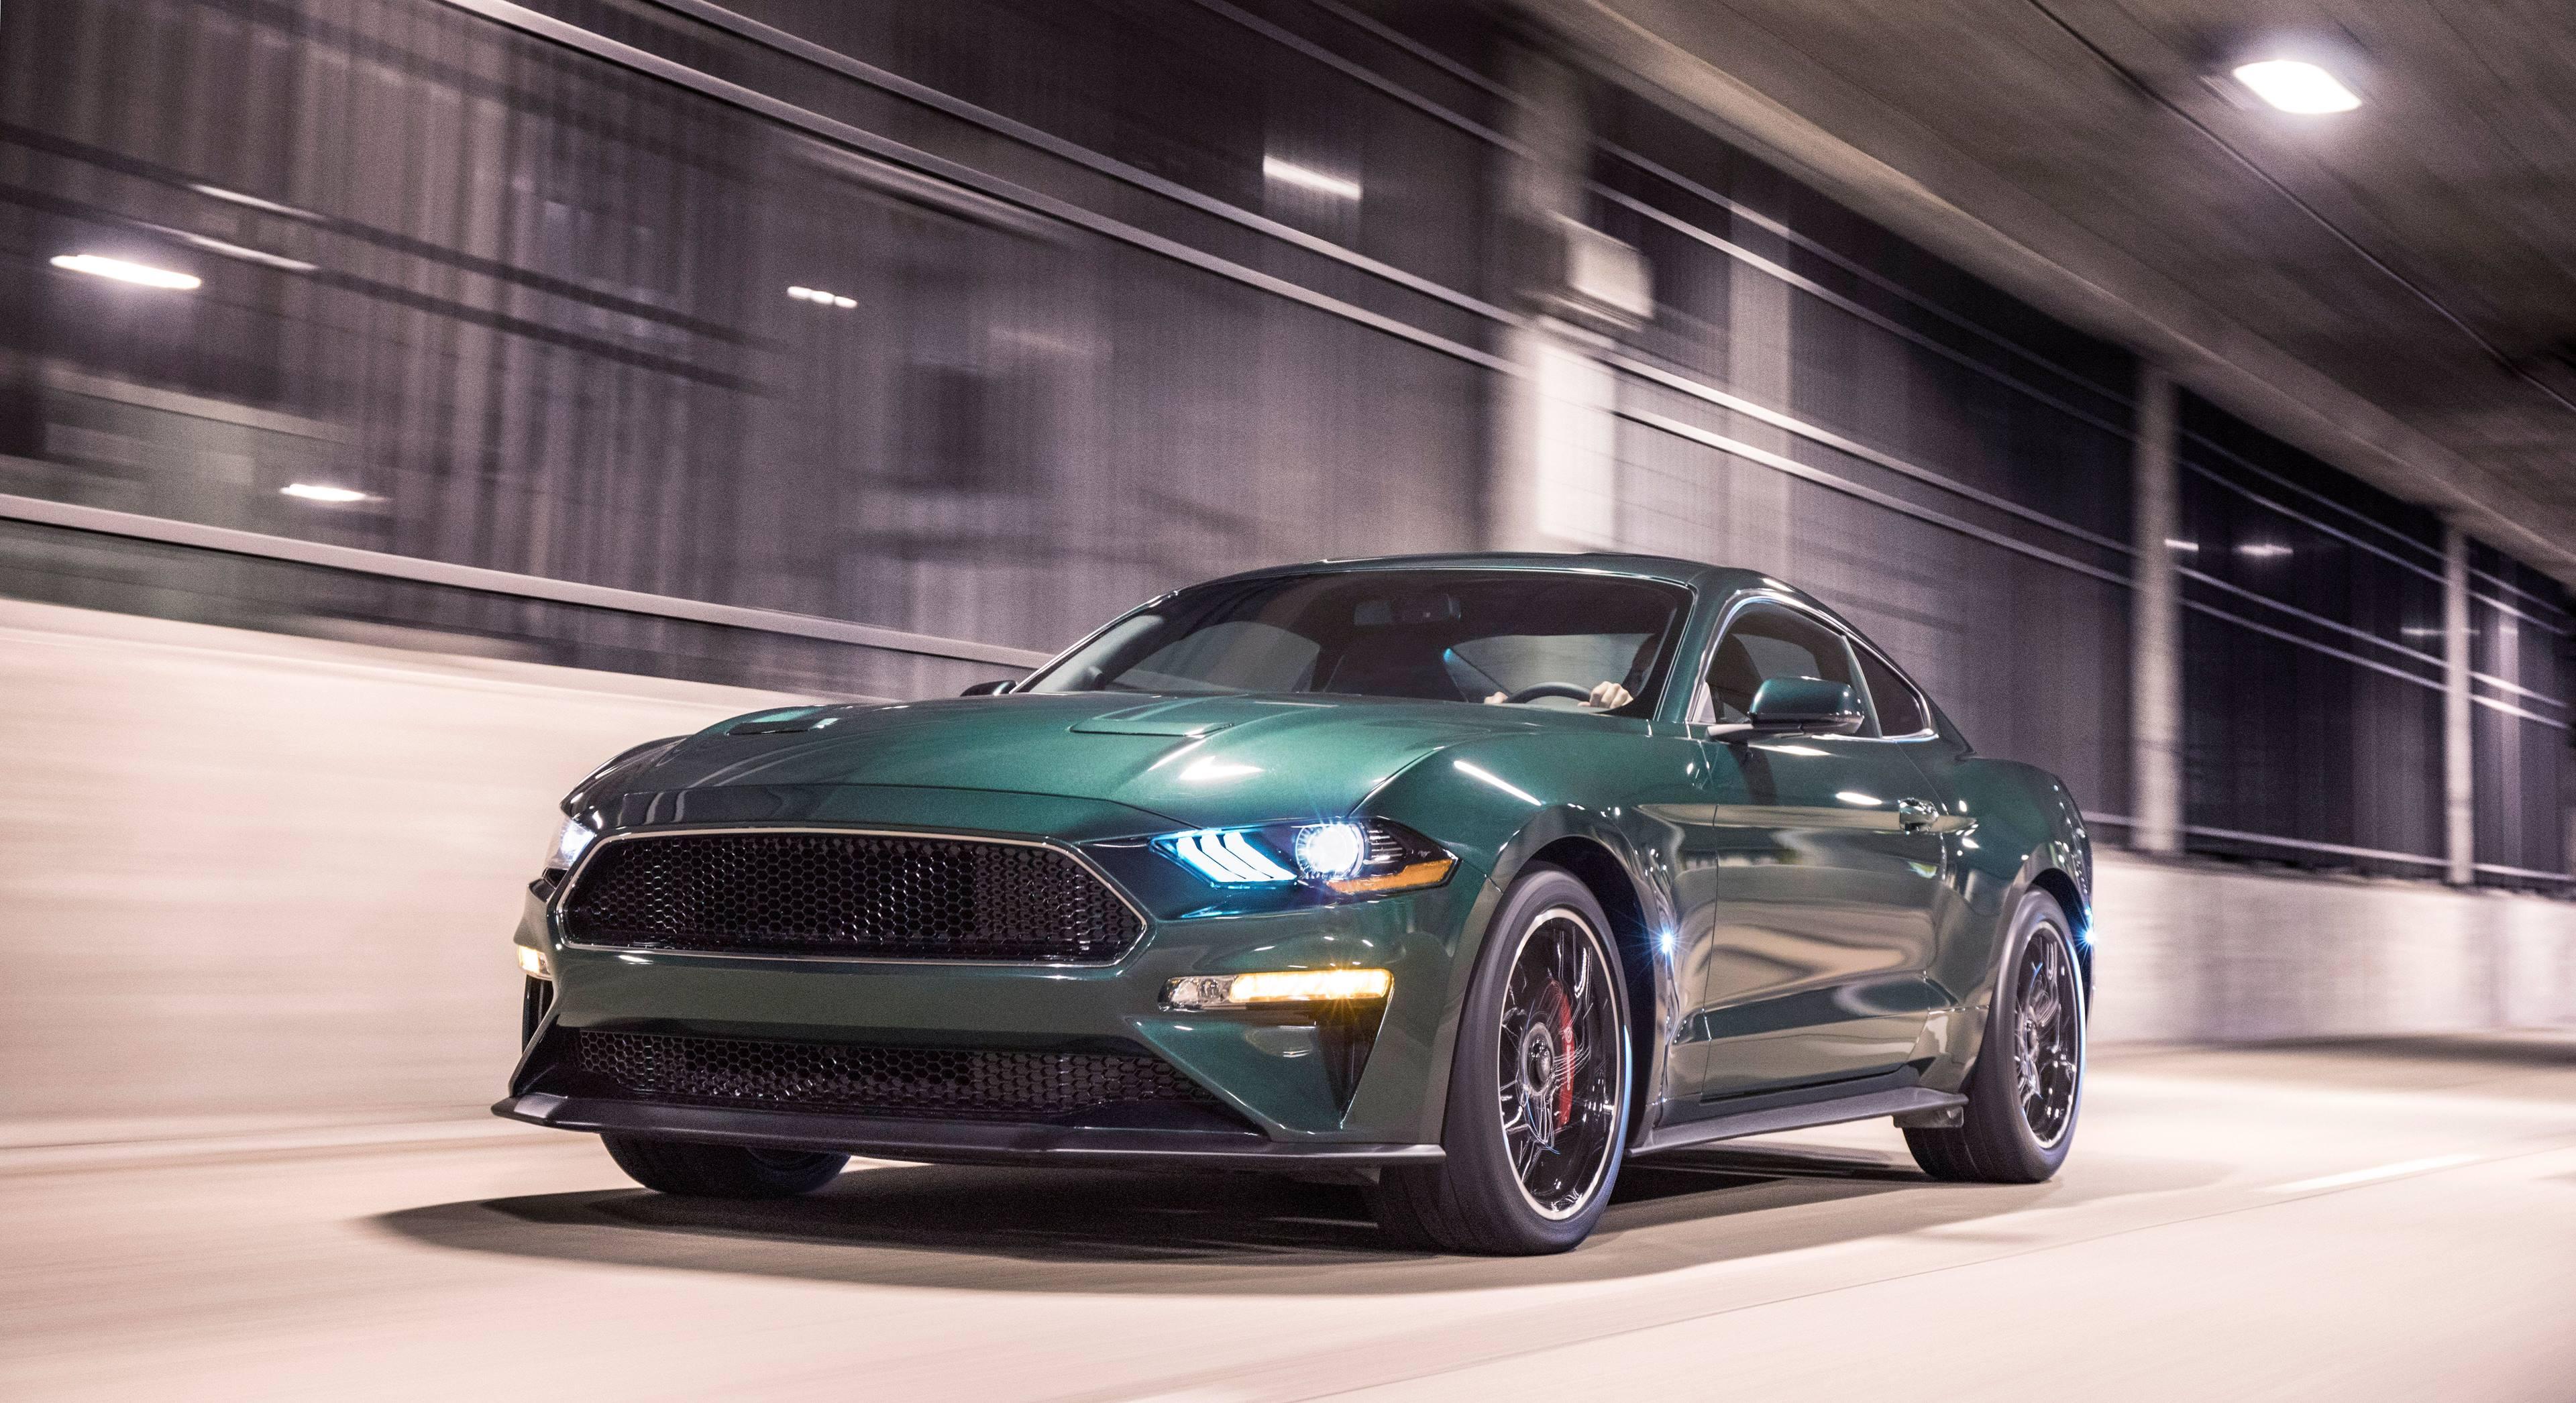 2019 Mustang Bullitt front 3/4